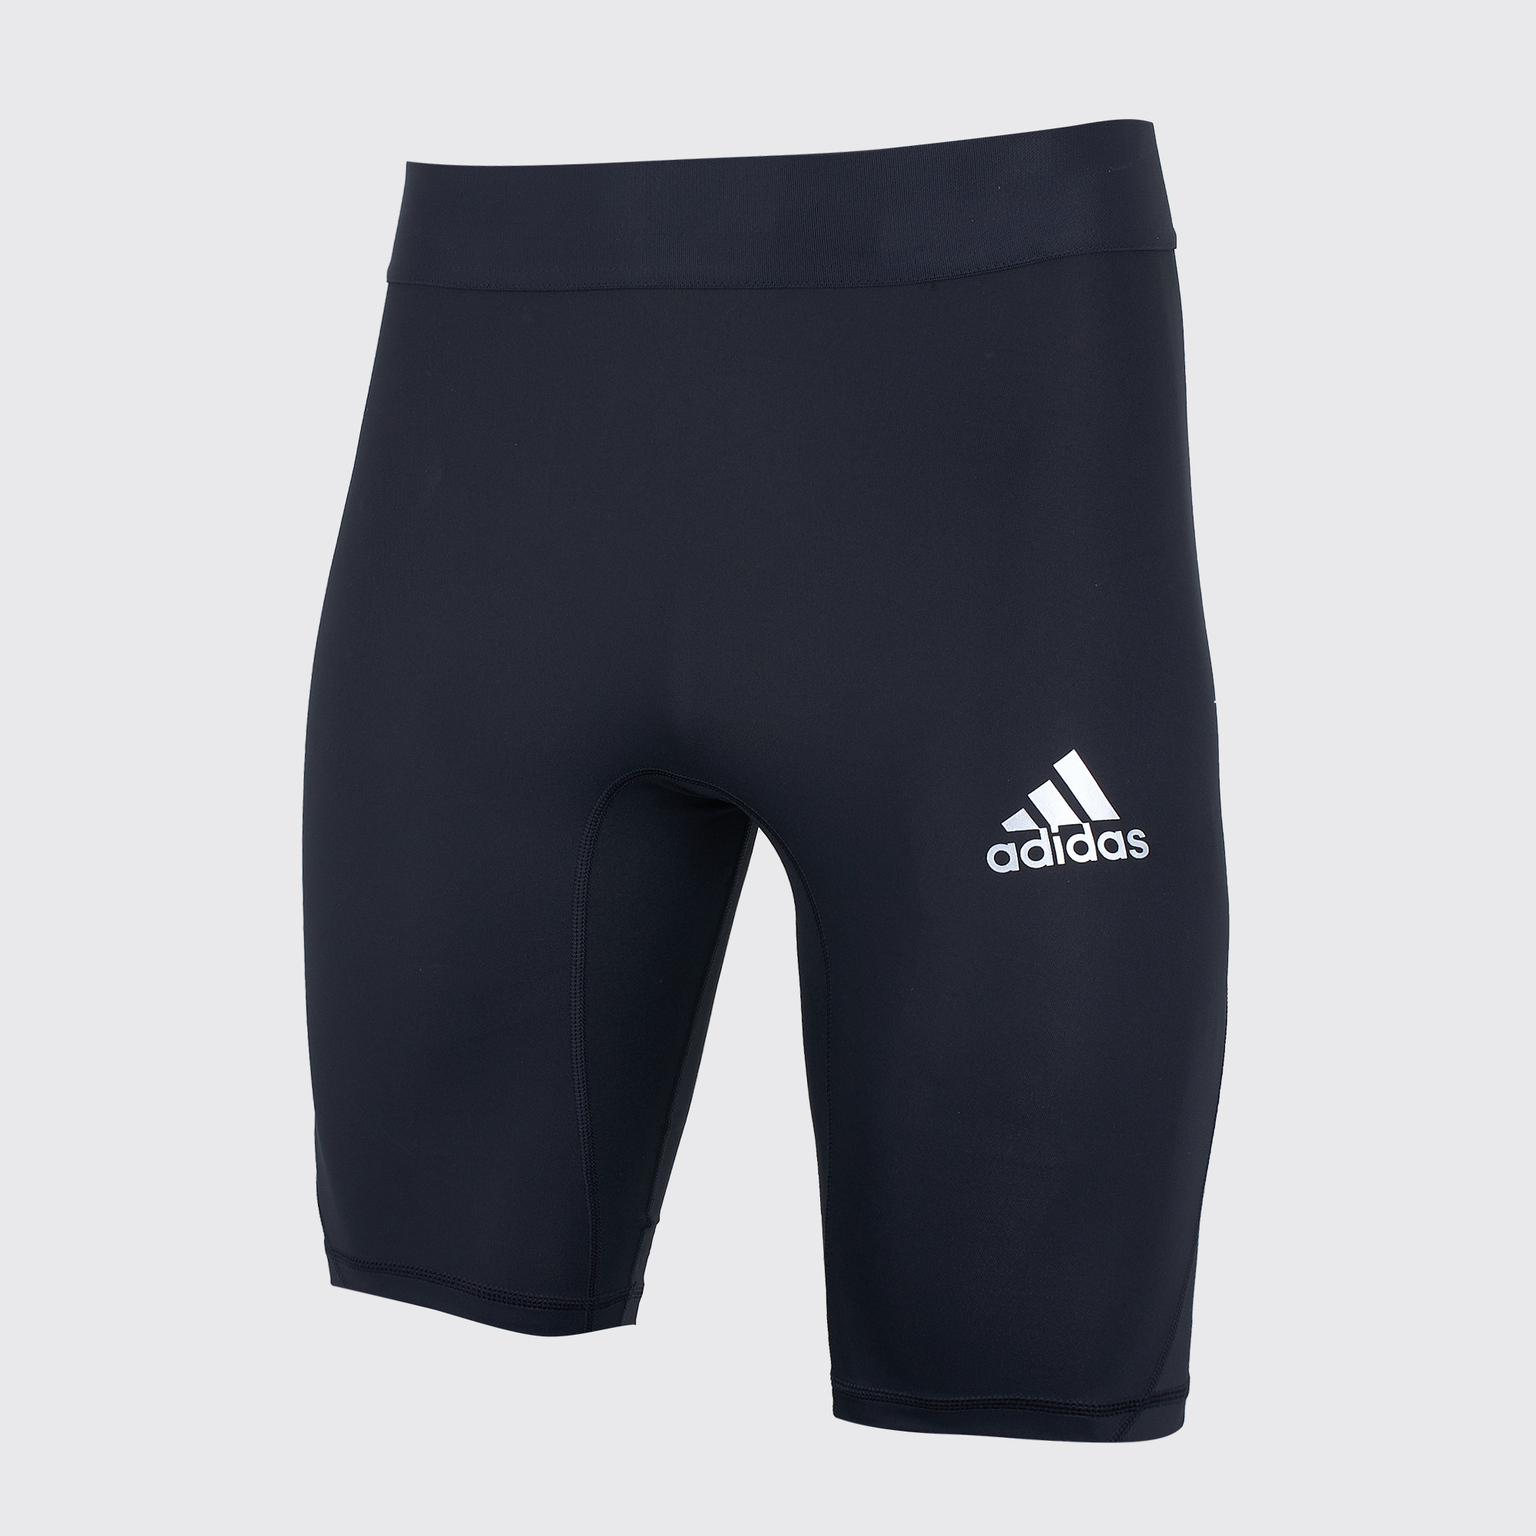 Белье шорты Adidas Alphaskin Sport CW9456 белье шорты adidas alphaskin sport cw9458